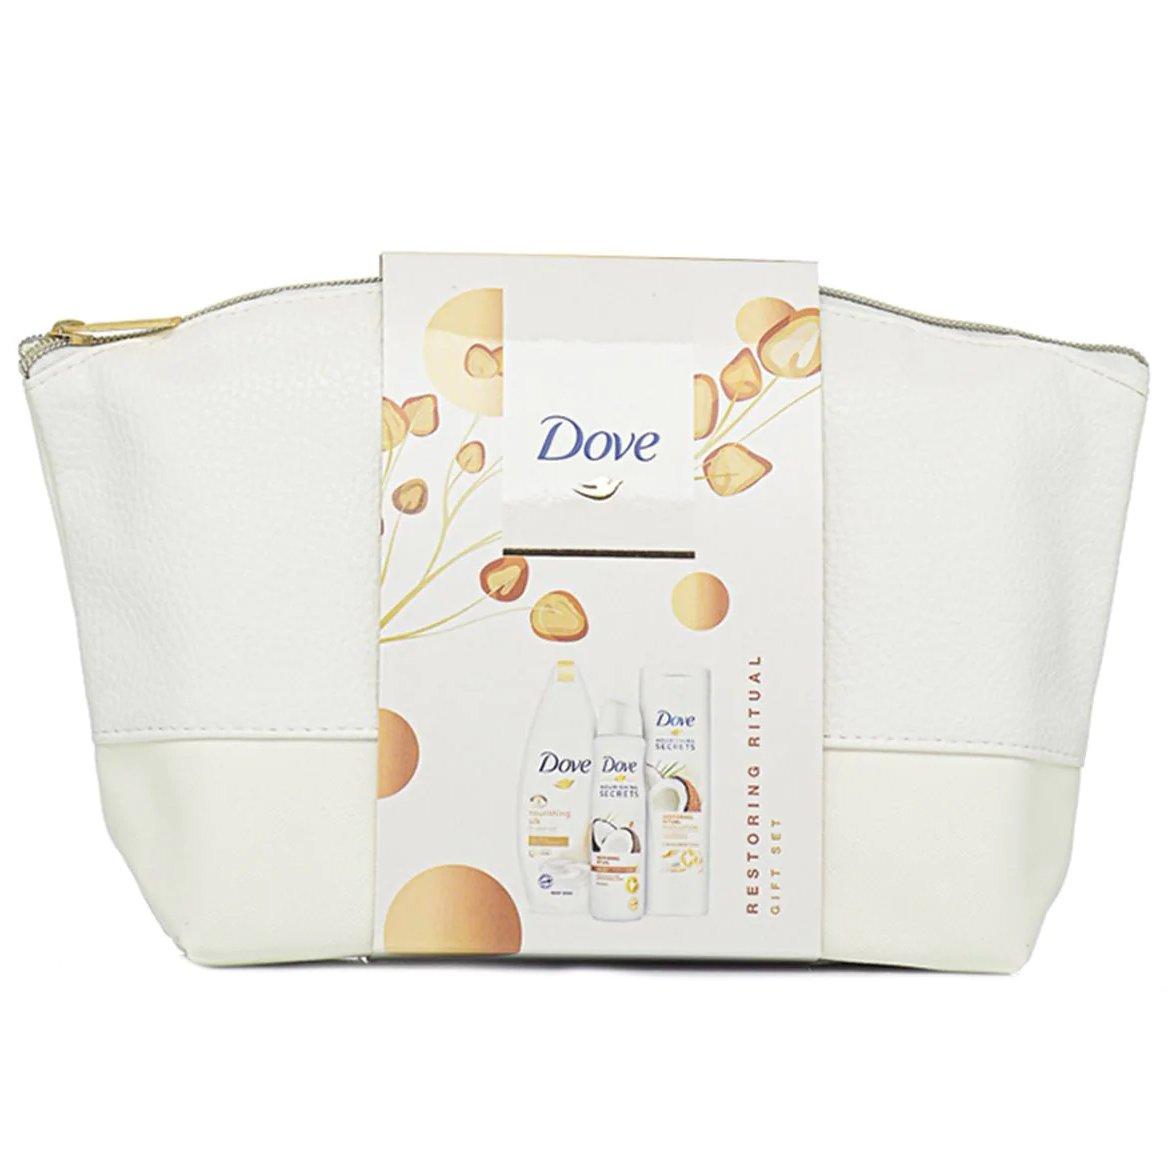 Dove Πακέτο Προσφοράς Nourishing Secrets Coconut Σετ Περιποίησης με Αφρόλουτρο 250ml, Γαλάκτωμα Σώματος 250ml & Deo Spray 150ml